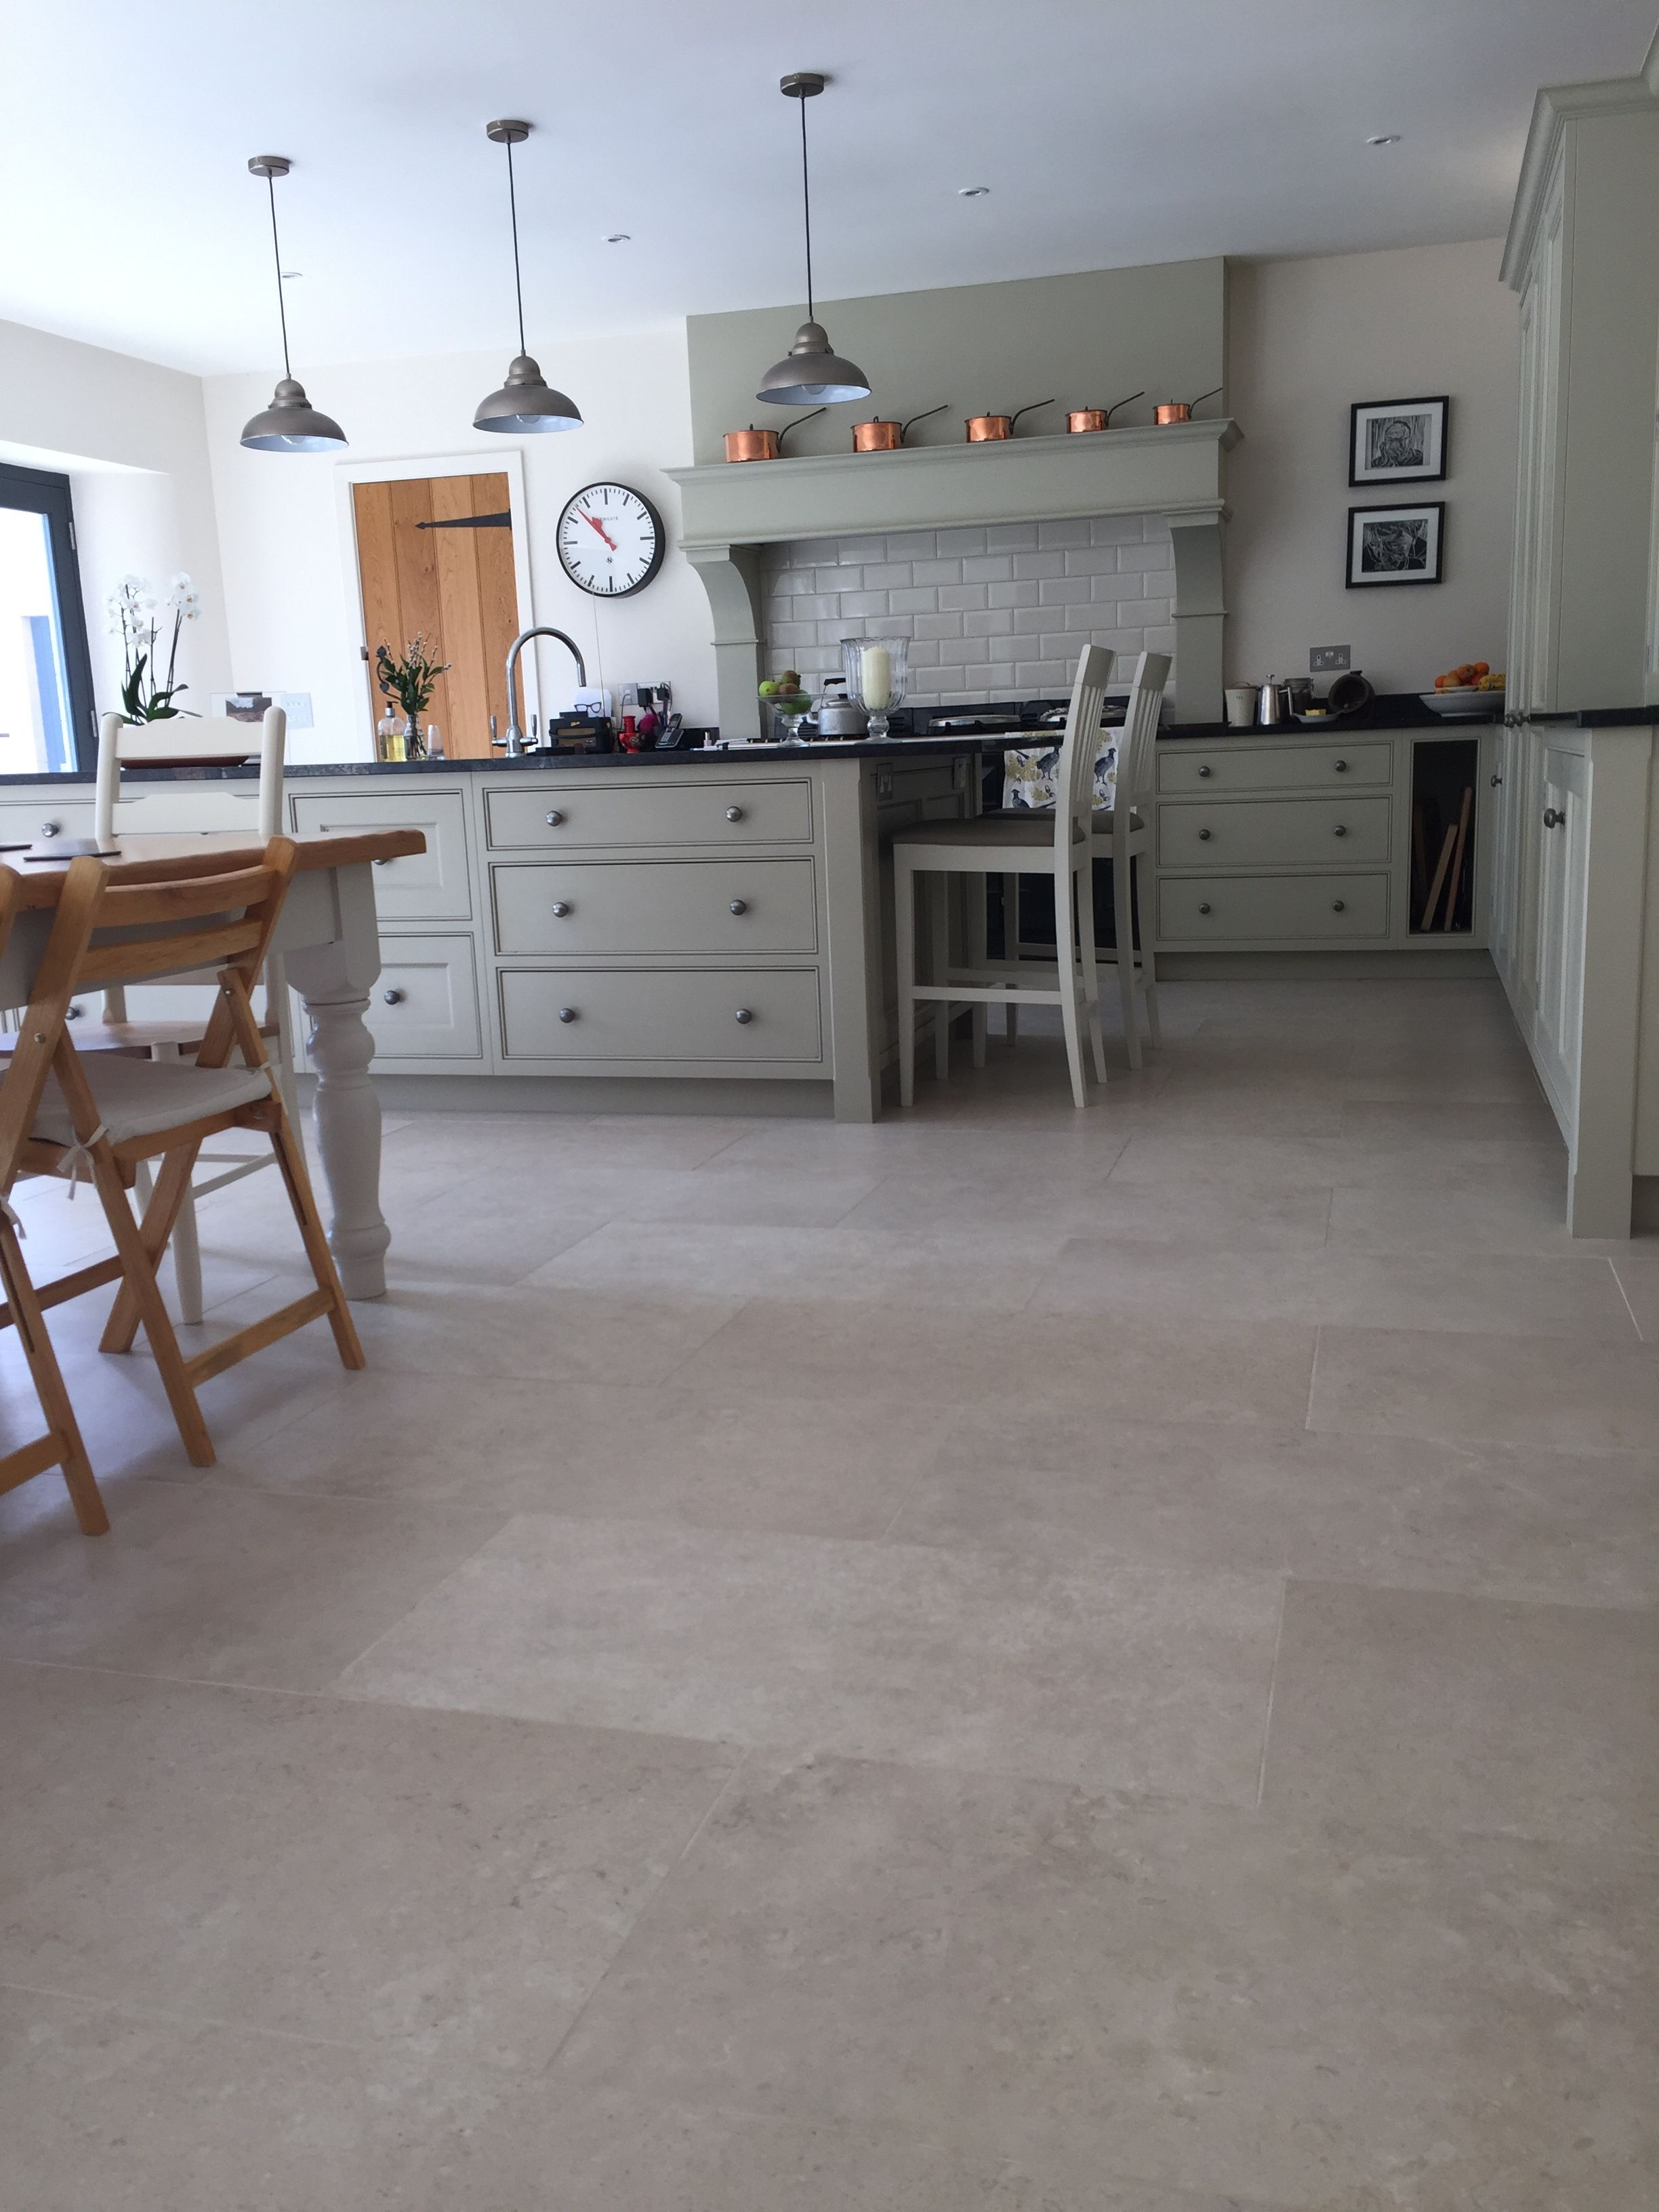 Heritage Stone Porcelain Tile 45x90cm Arguably The Best Limestone Look Porcelain A Porcelain Tile Floor Kitchen Tile Floor Living Room Family Room Remodel